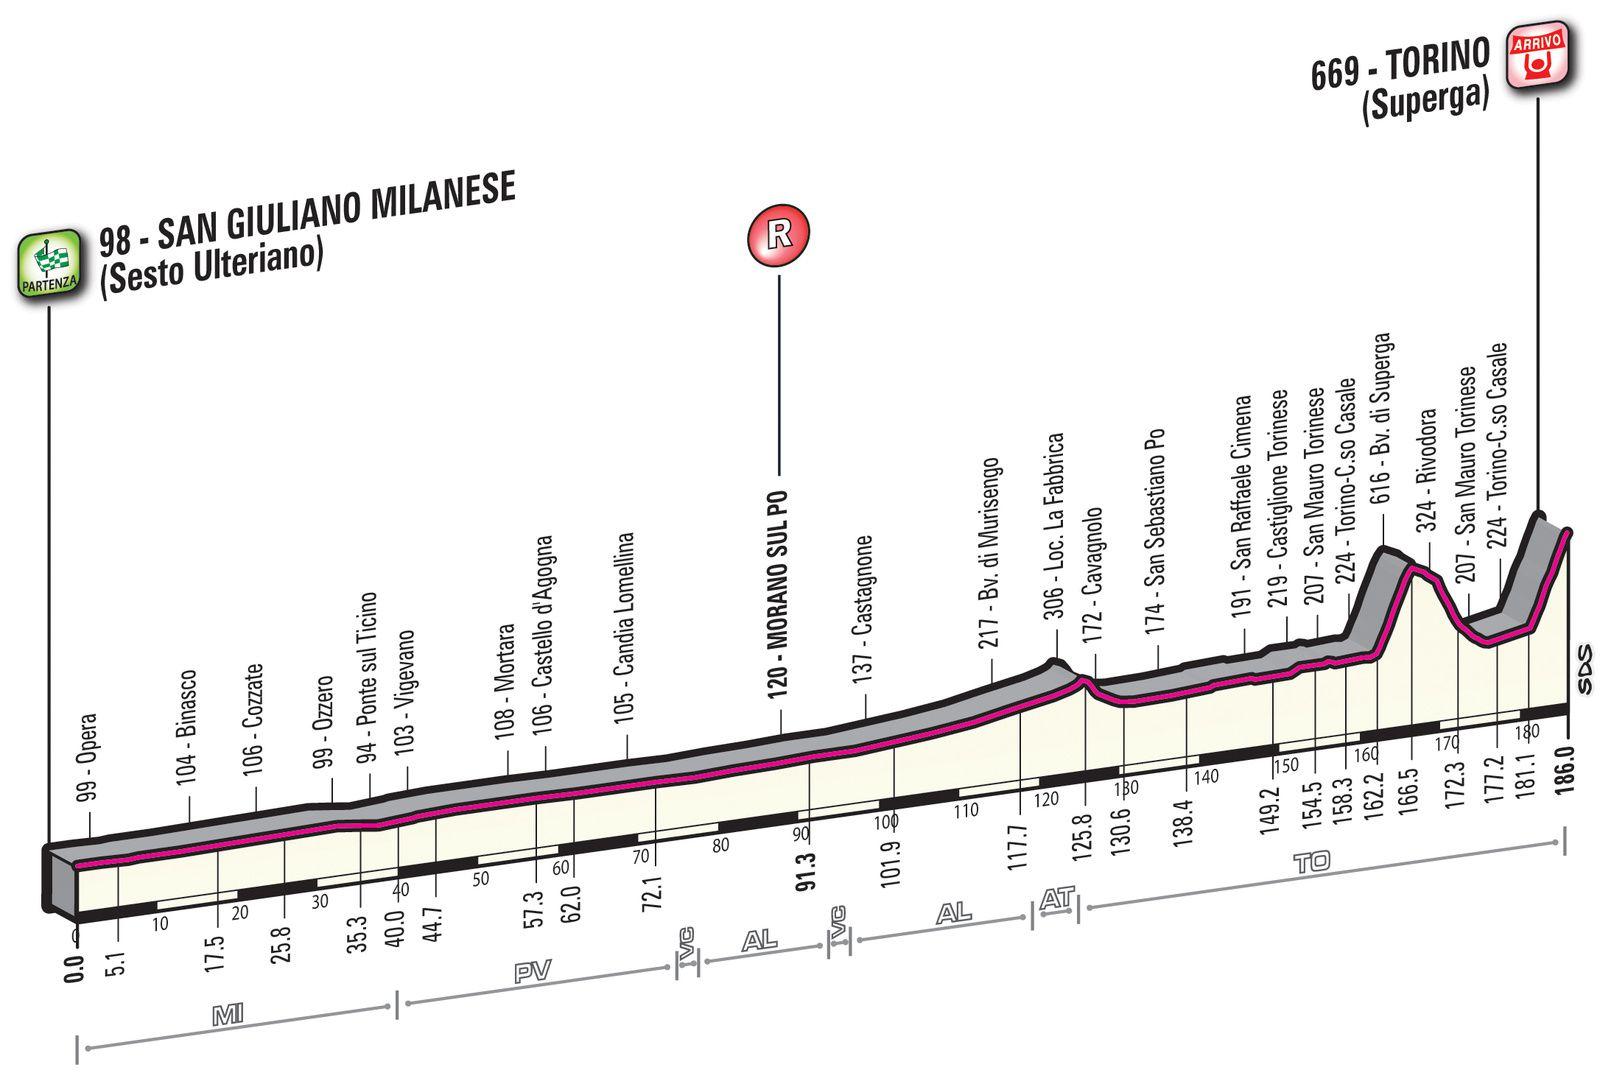 Profil de Milan Turin